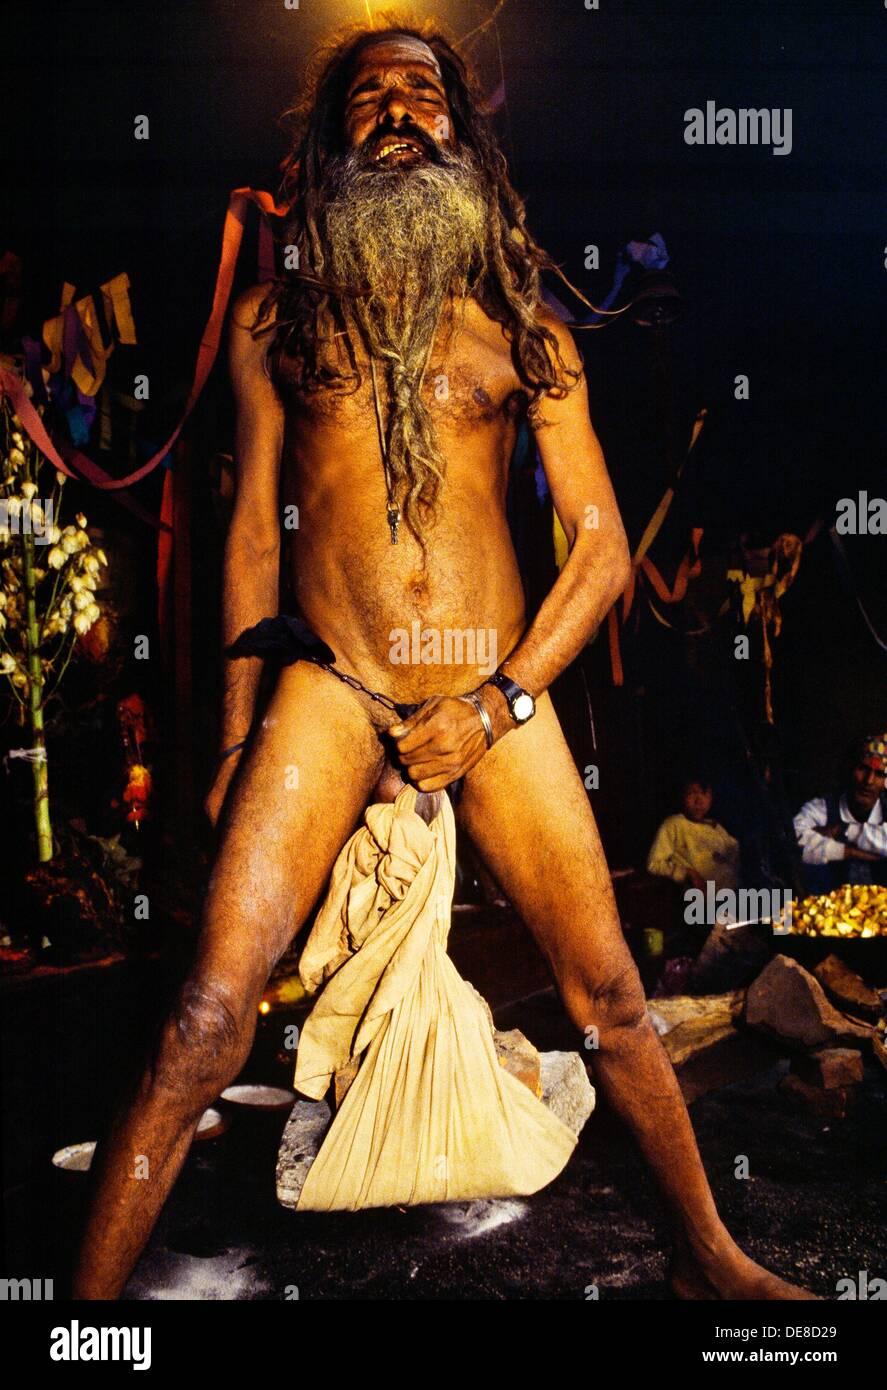 Sadhu holy man with very long rasta style dreadlock hair  Exibition  Pasupatinath  Katmandhu  Nepal - Stock Image